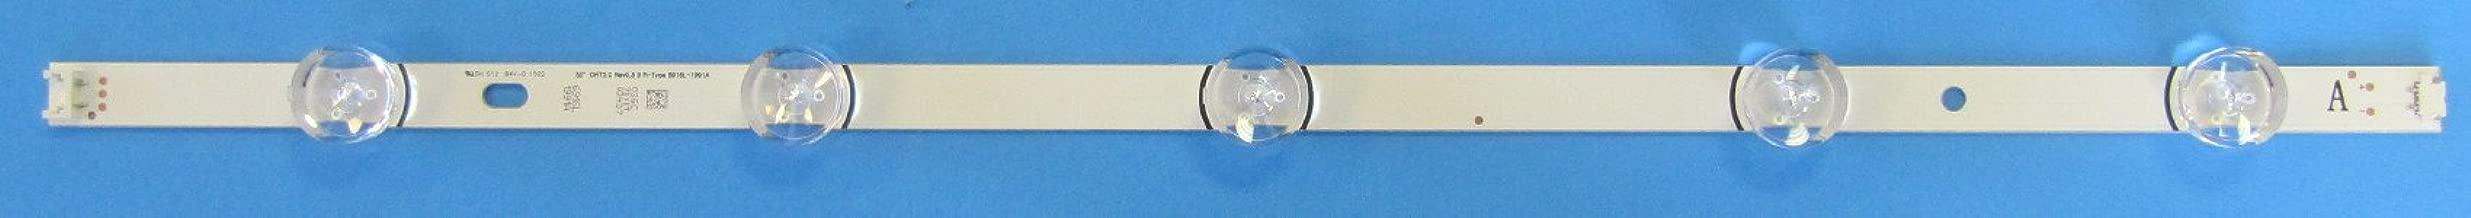 LG 6916L-1991A 5-LED Button Backlight A Strip R-Type for 55LF6090-UB 55LF6100-UA